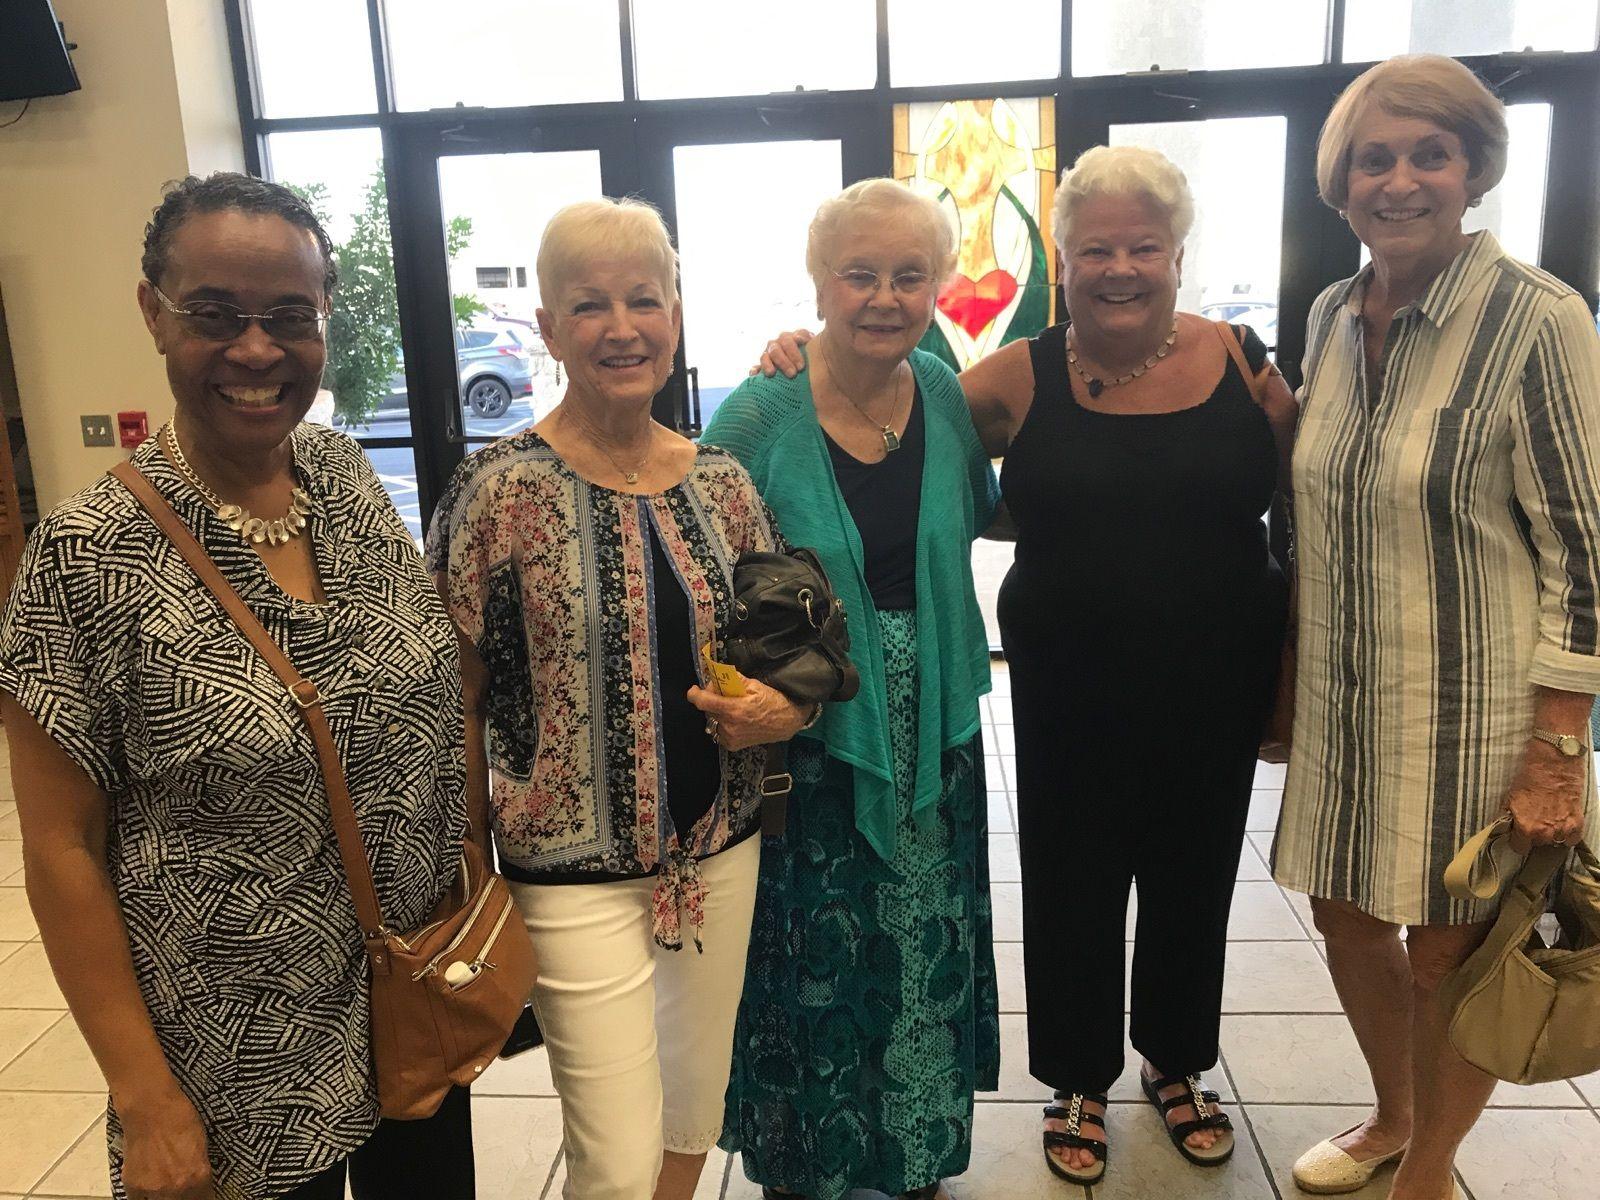 Senior dating groups in san francisco